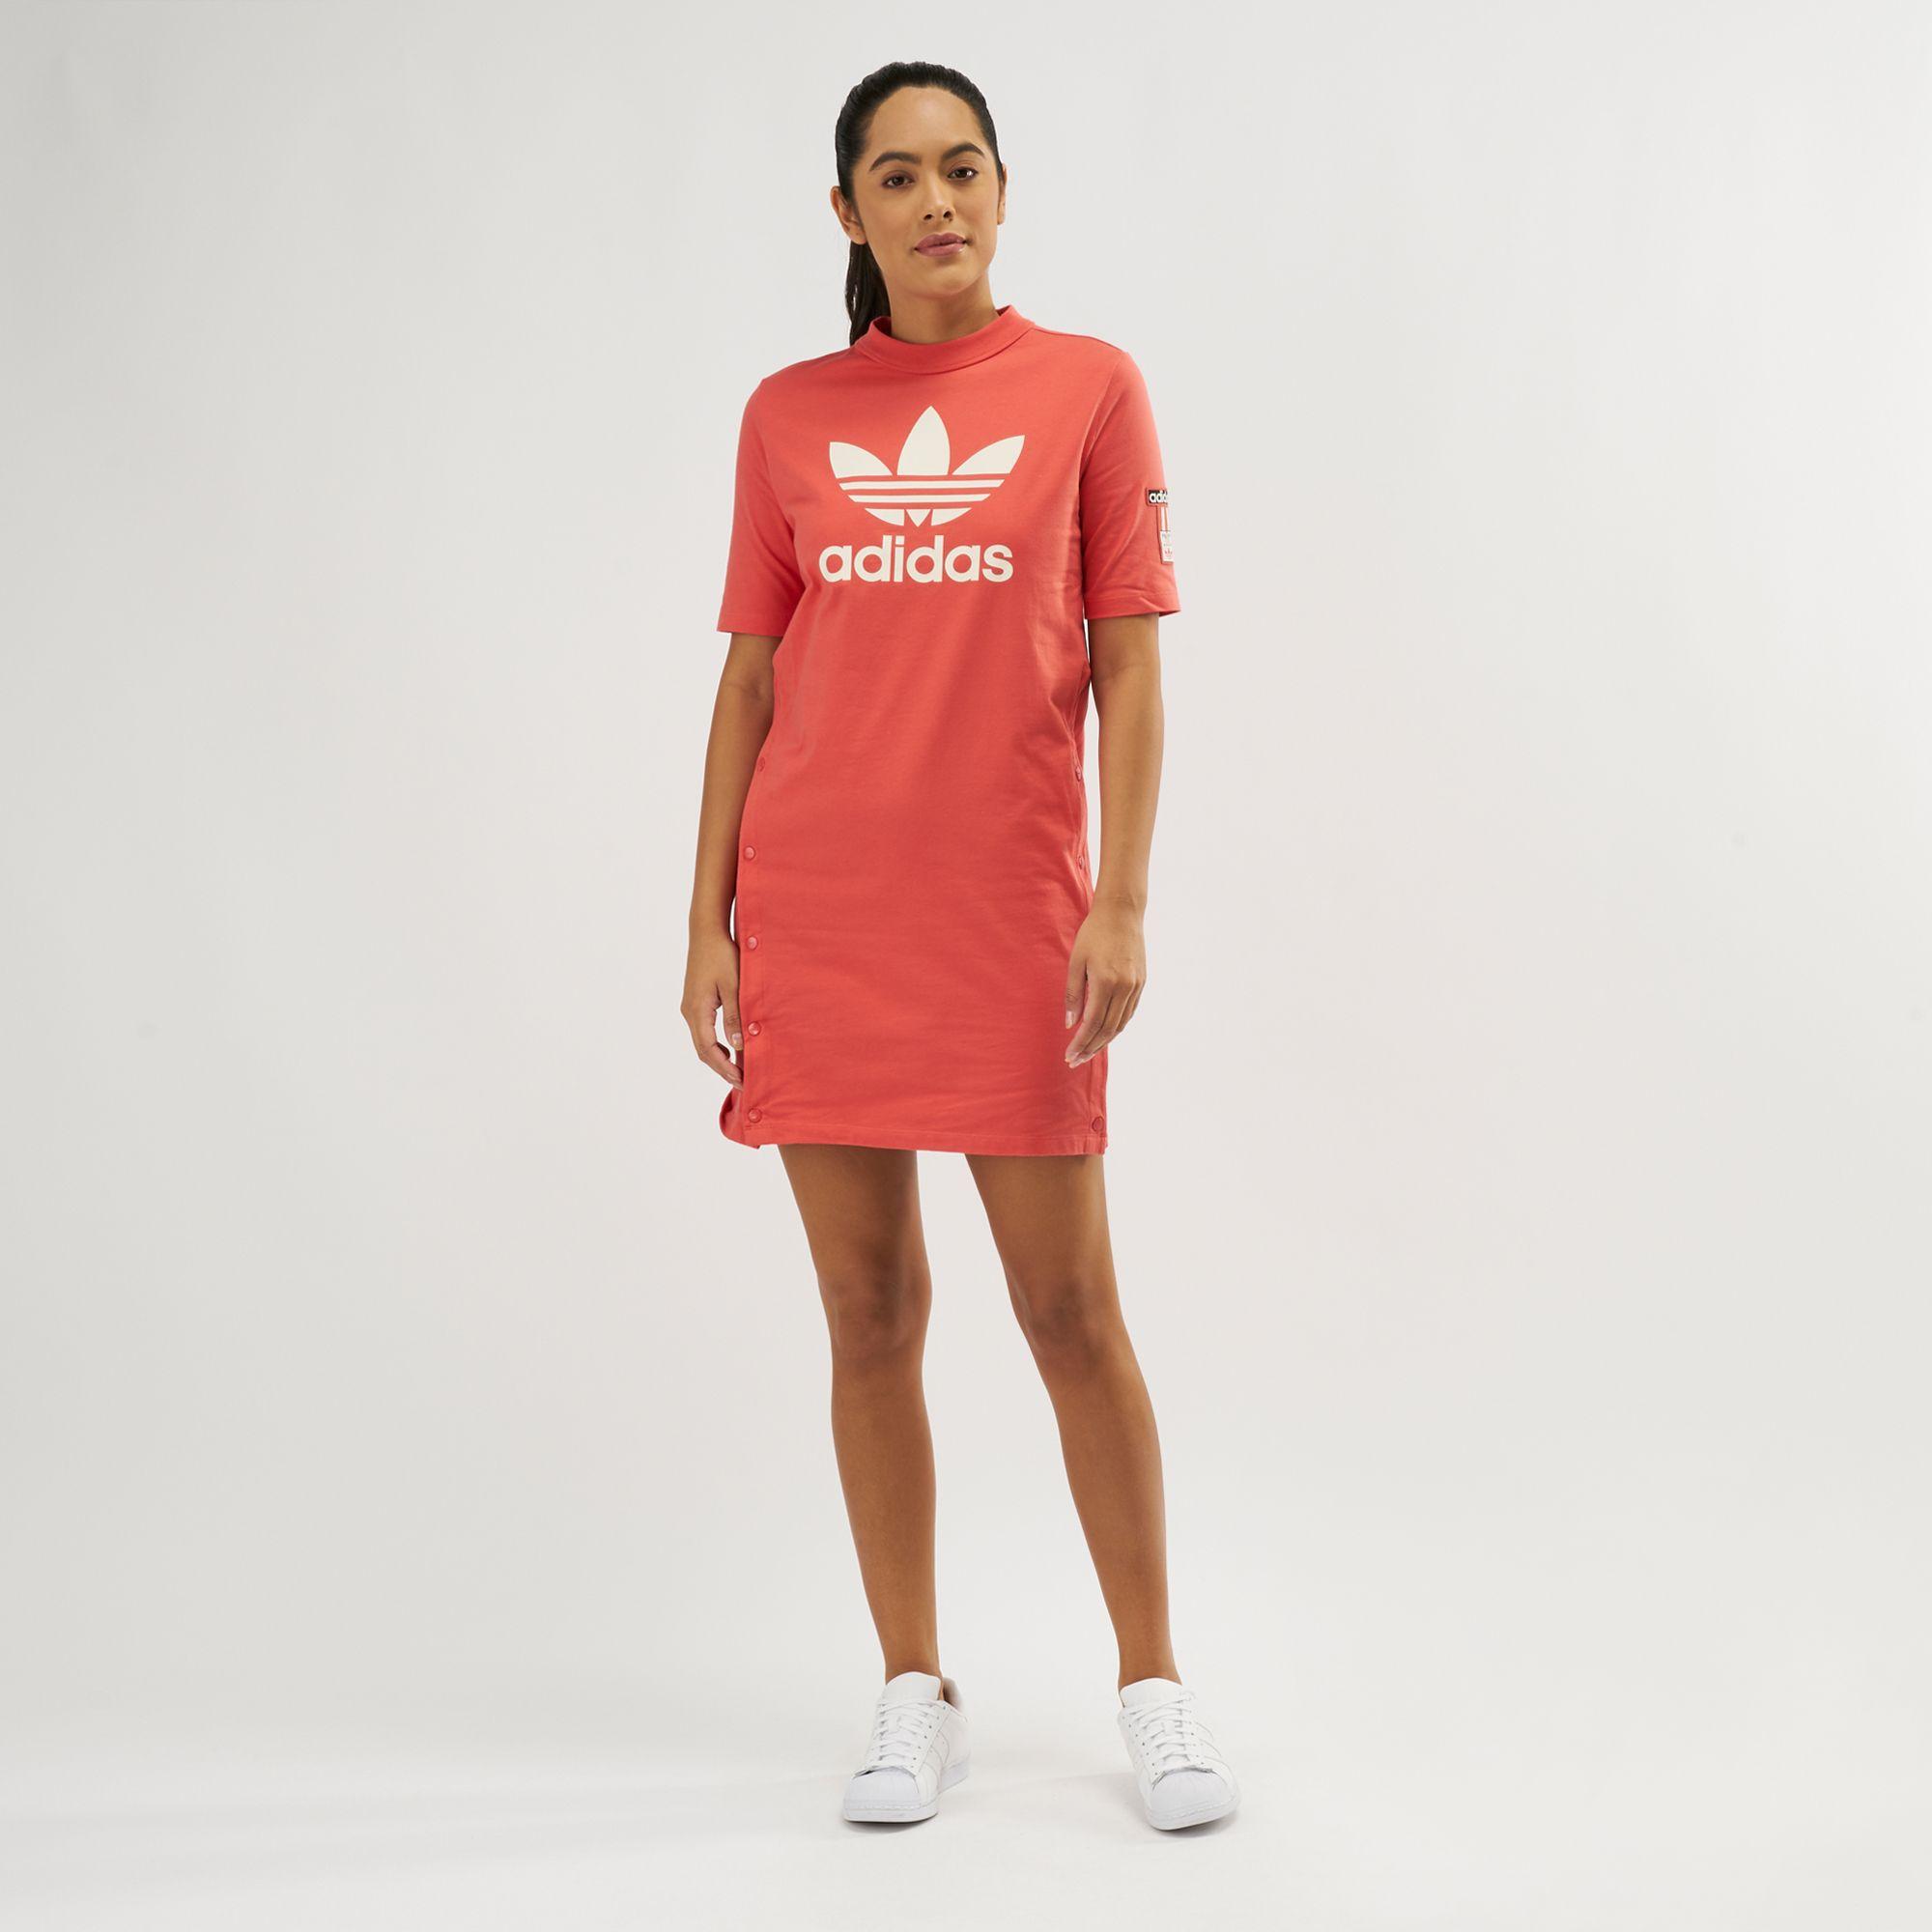 cbb3f78d9c2e adidas Originals Adibreak Tee Dress